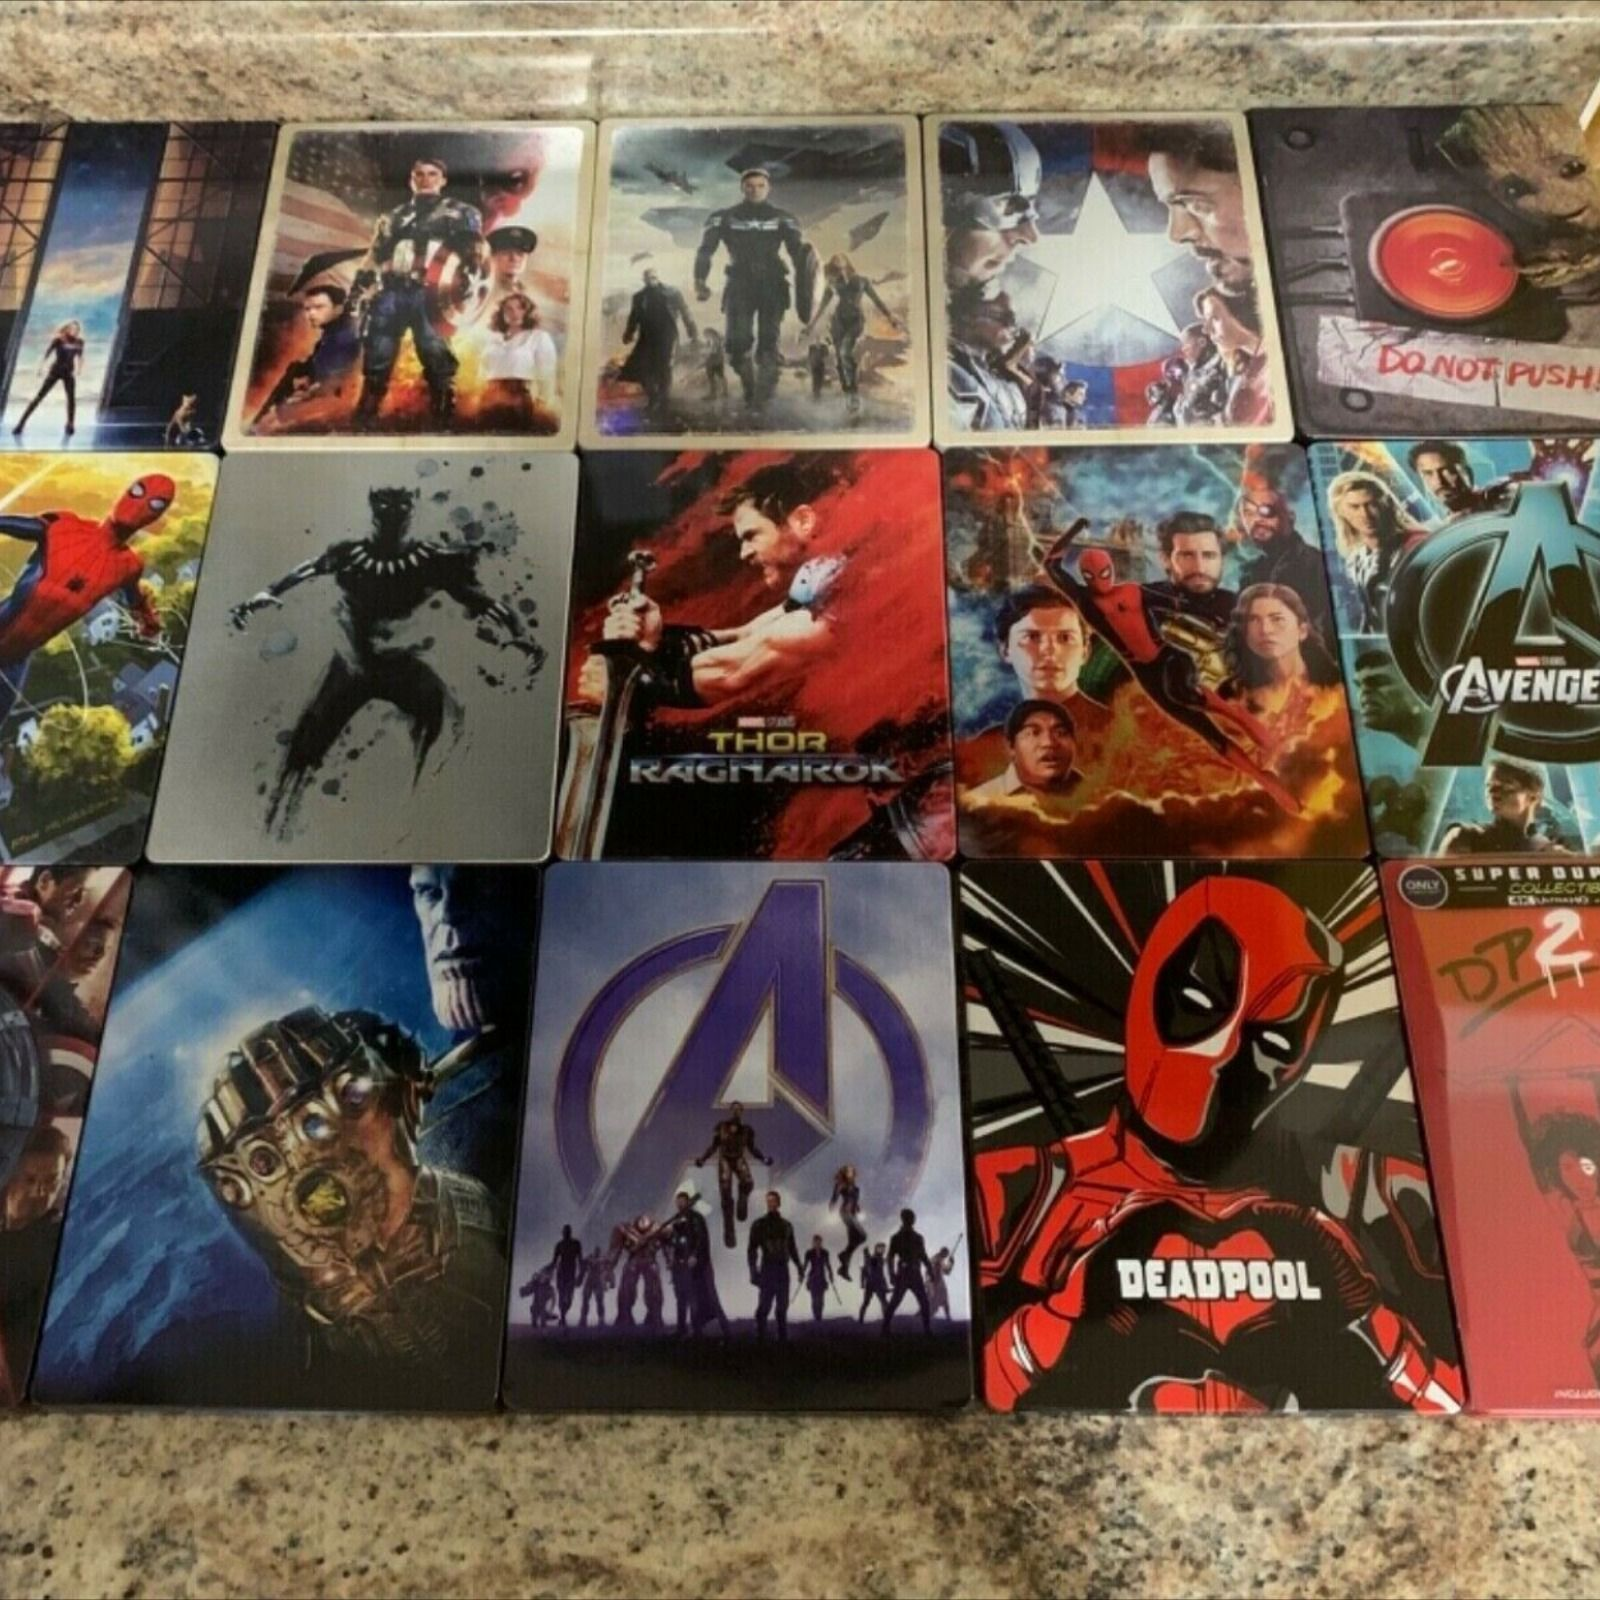 #Marvel #MarvelStudios #MarvelCinematicUniverse #MCU #4K #UHD #BluRay #Steelbook #Collection